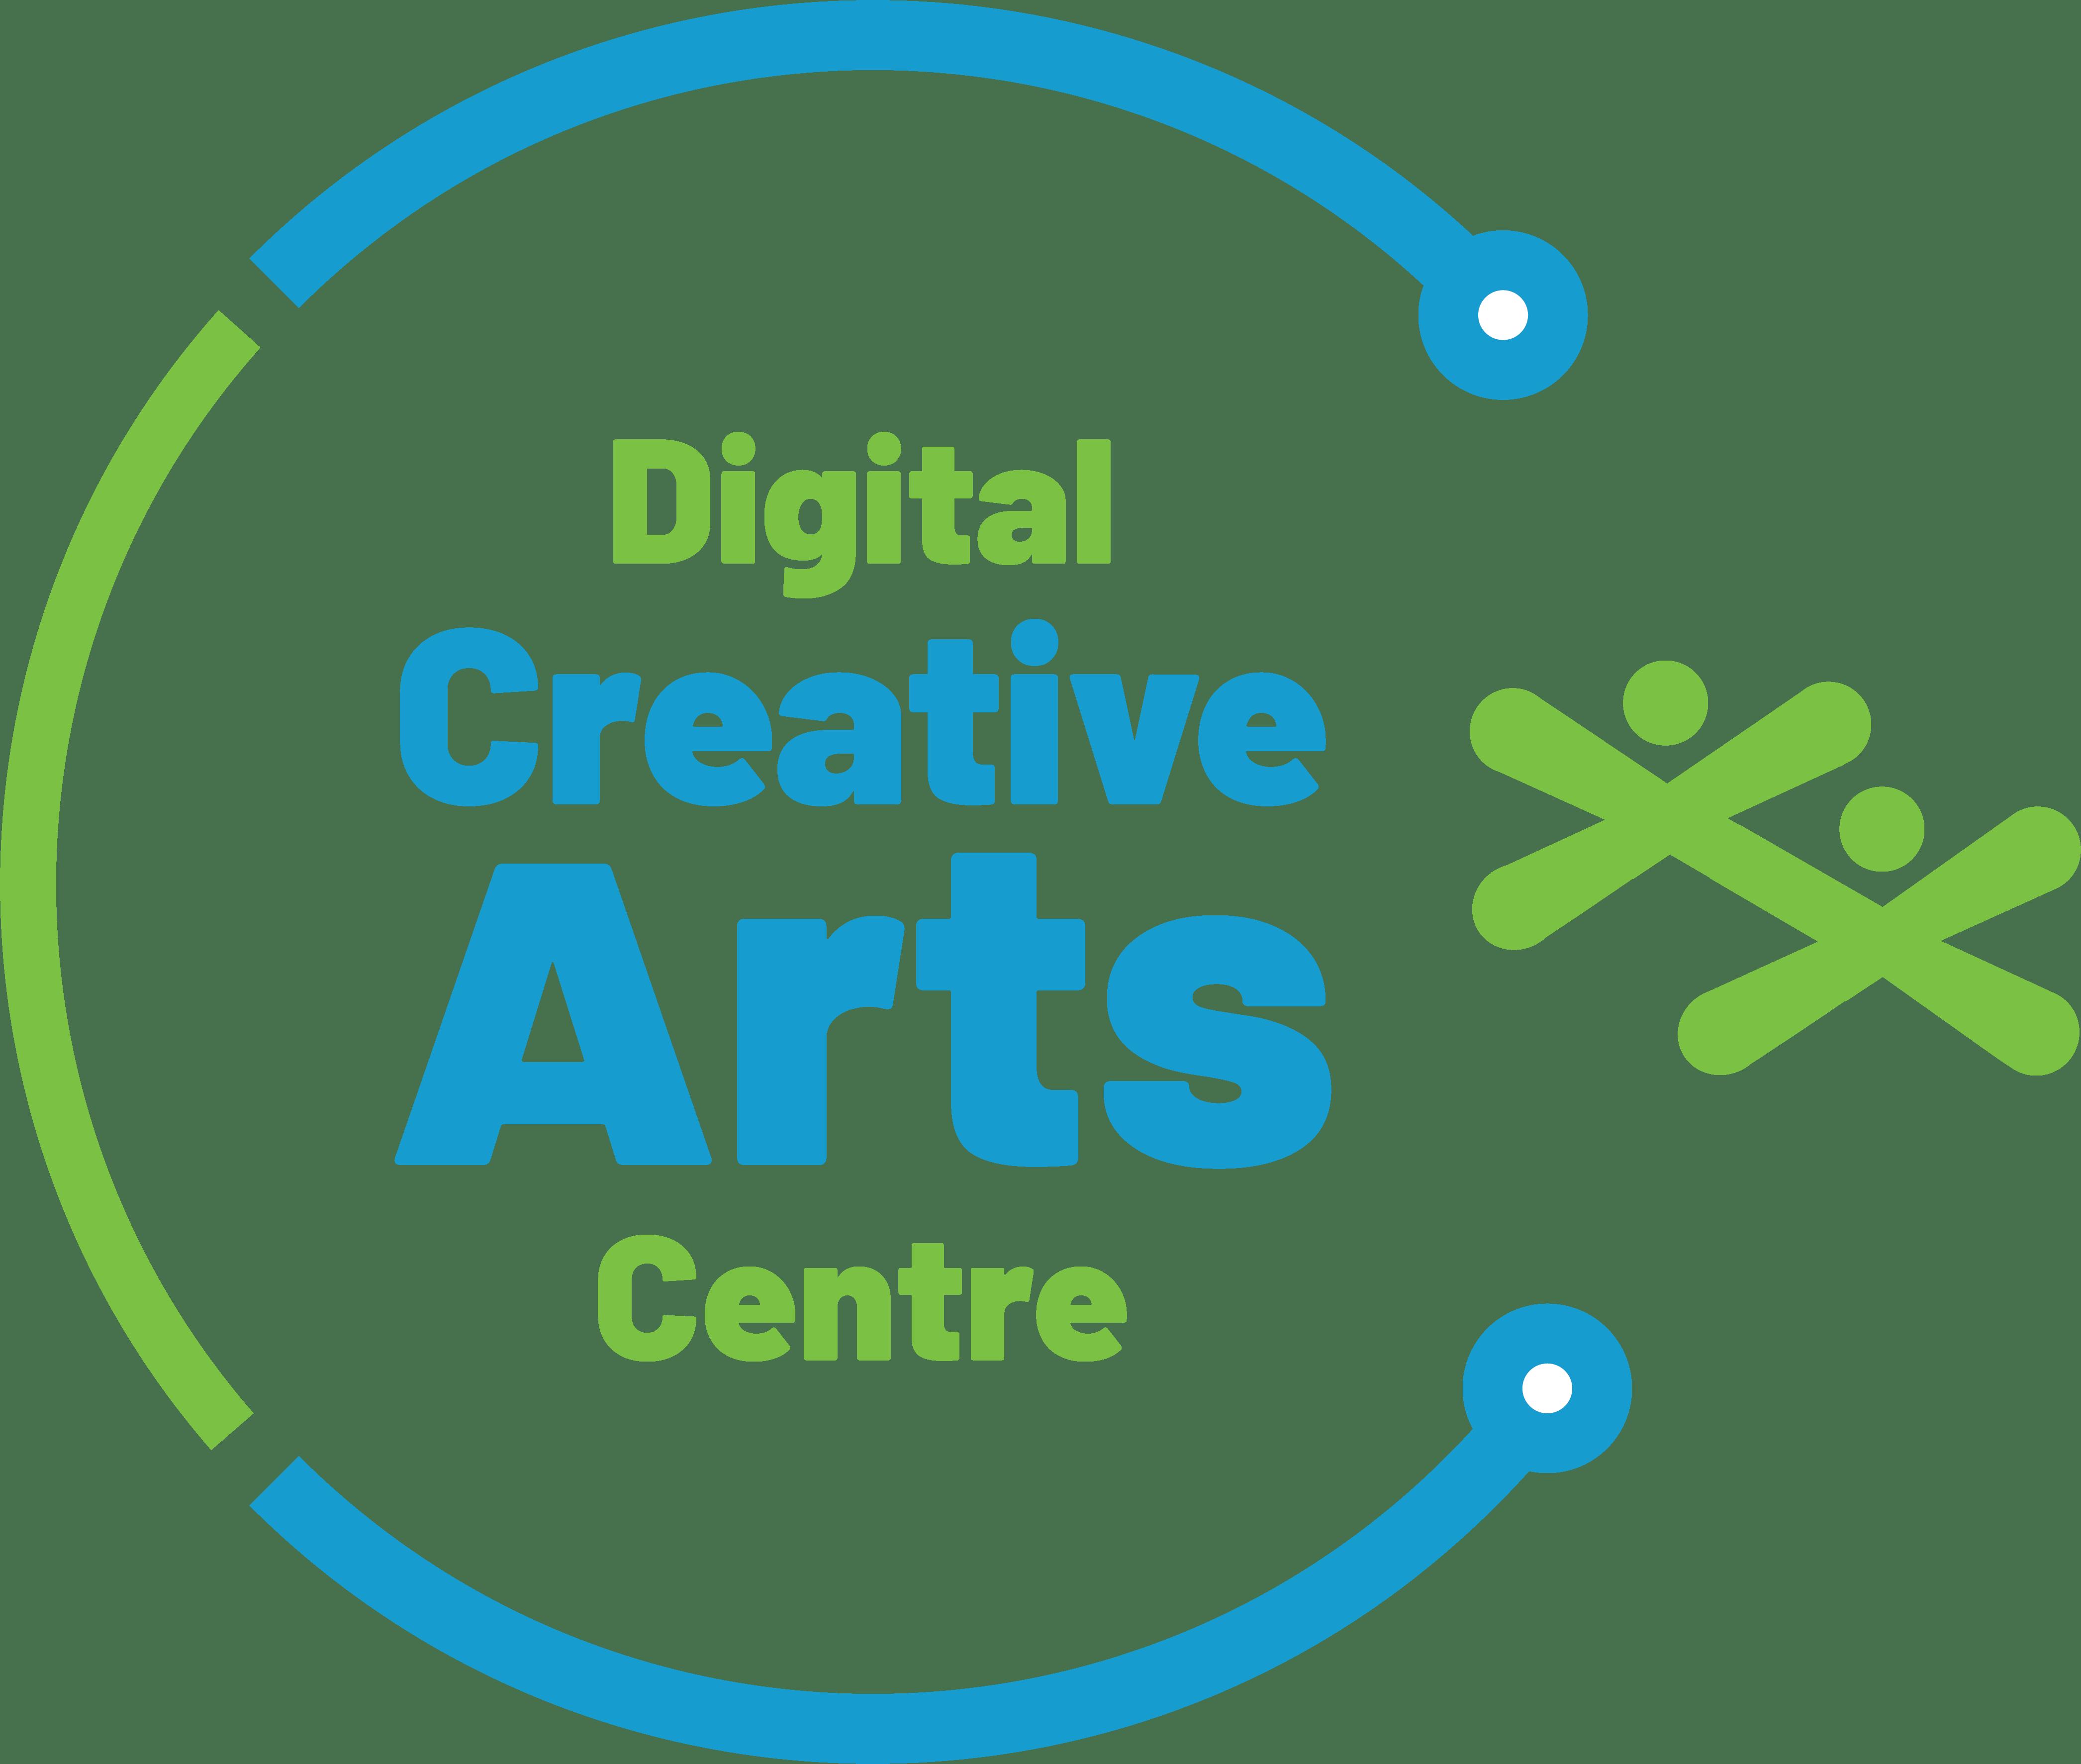 The Digital Creative Arts Centre Logo